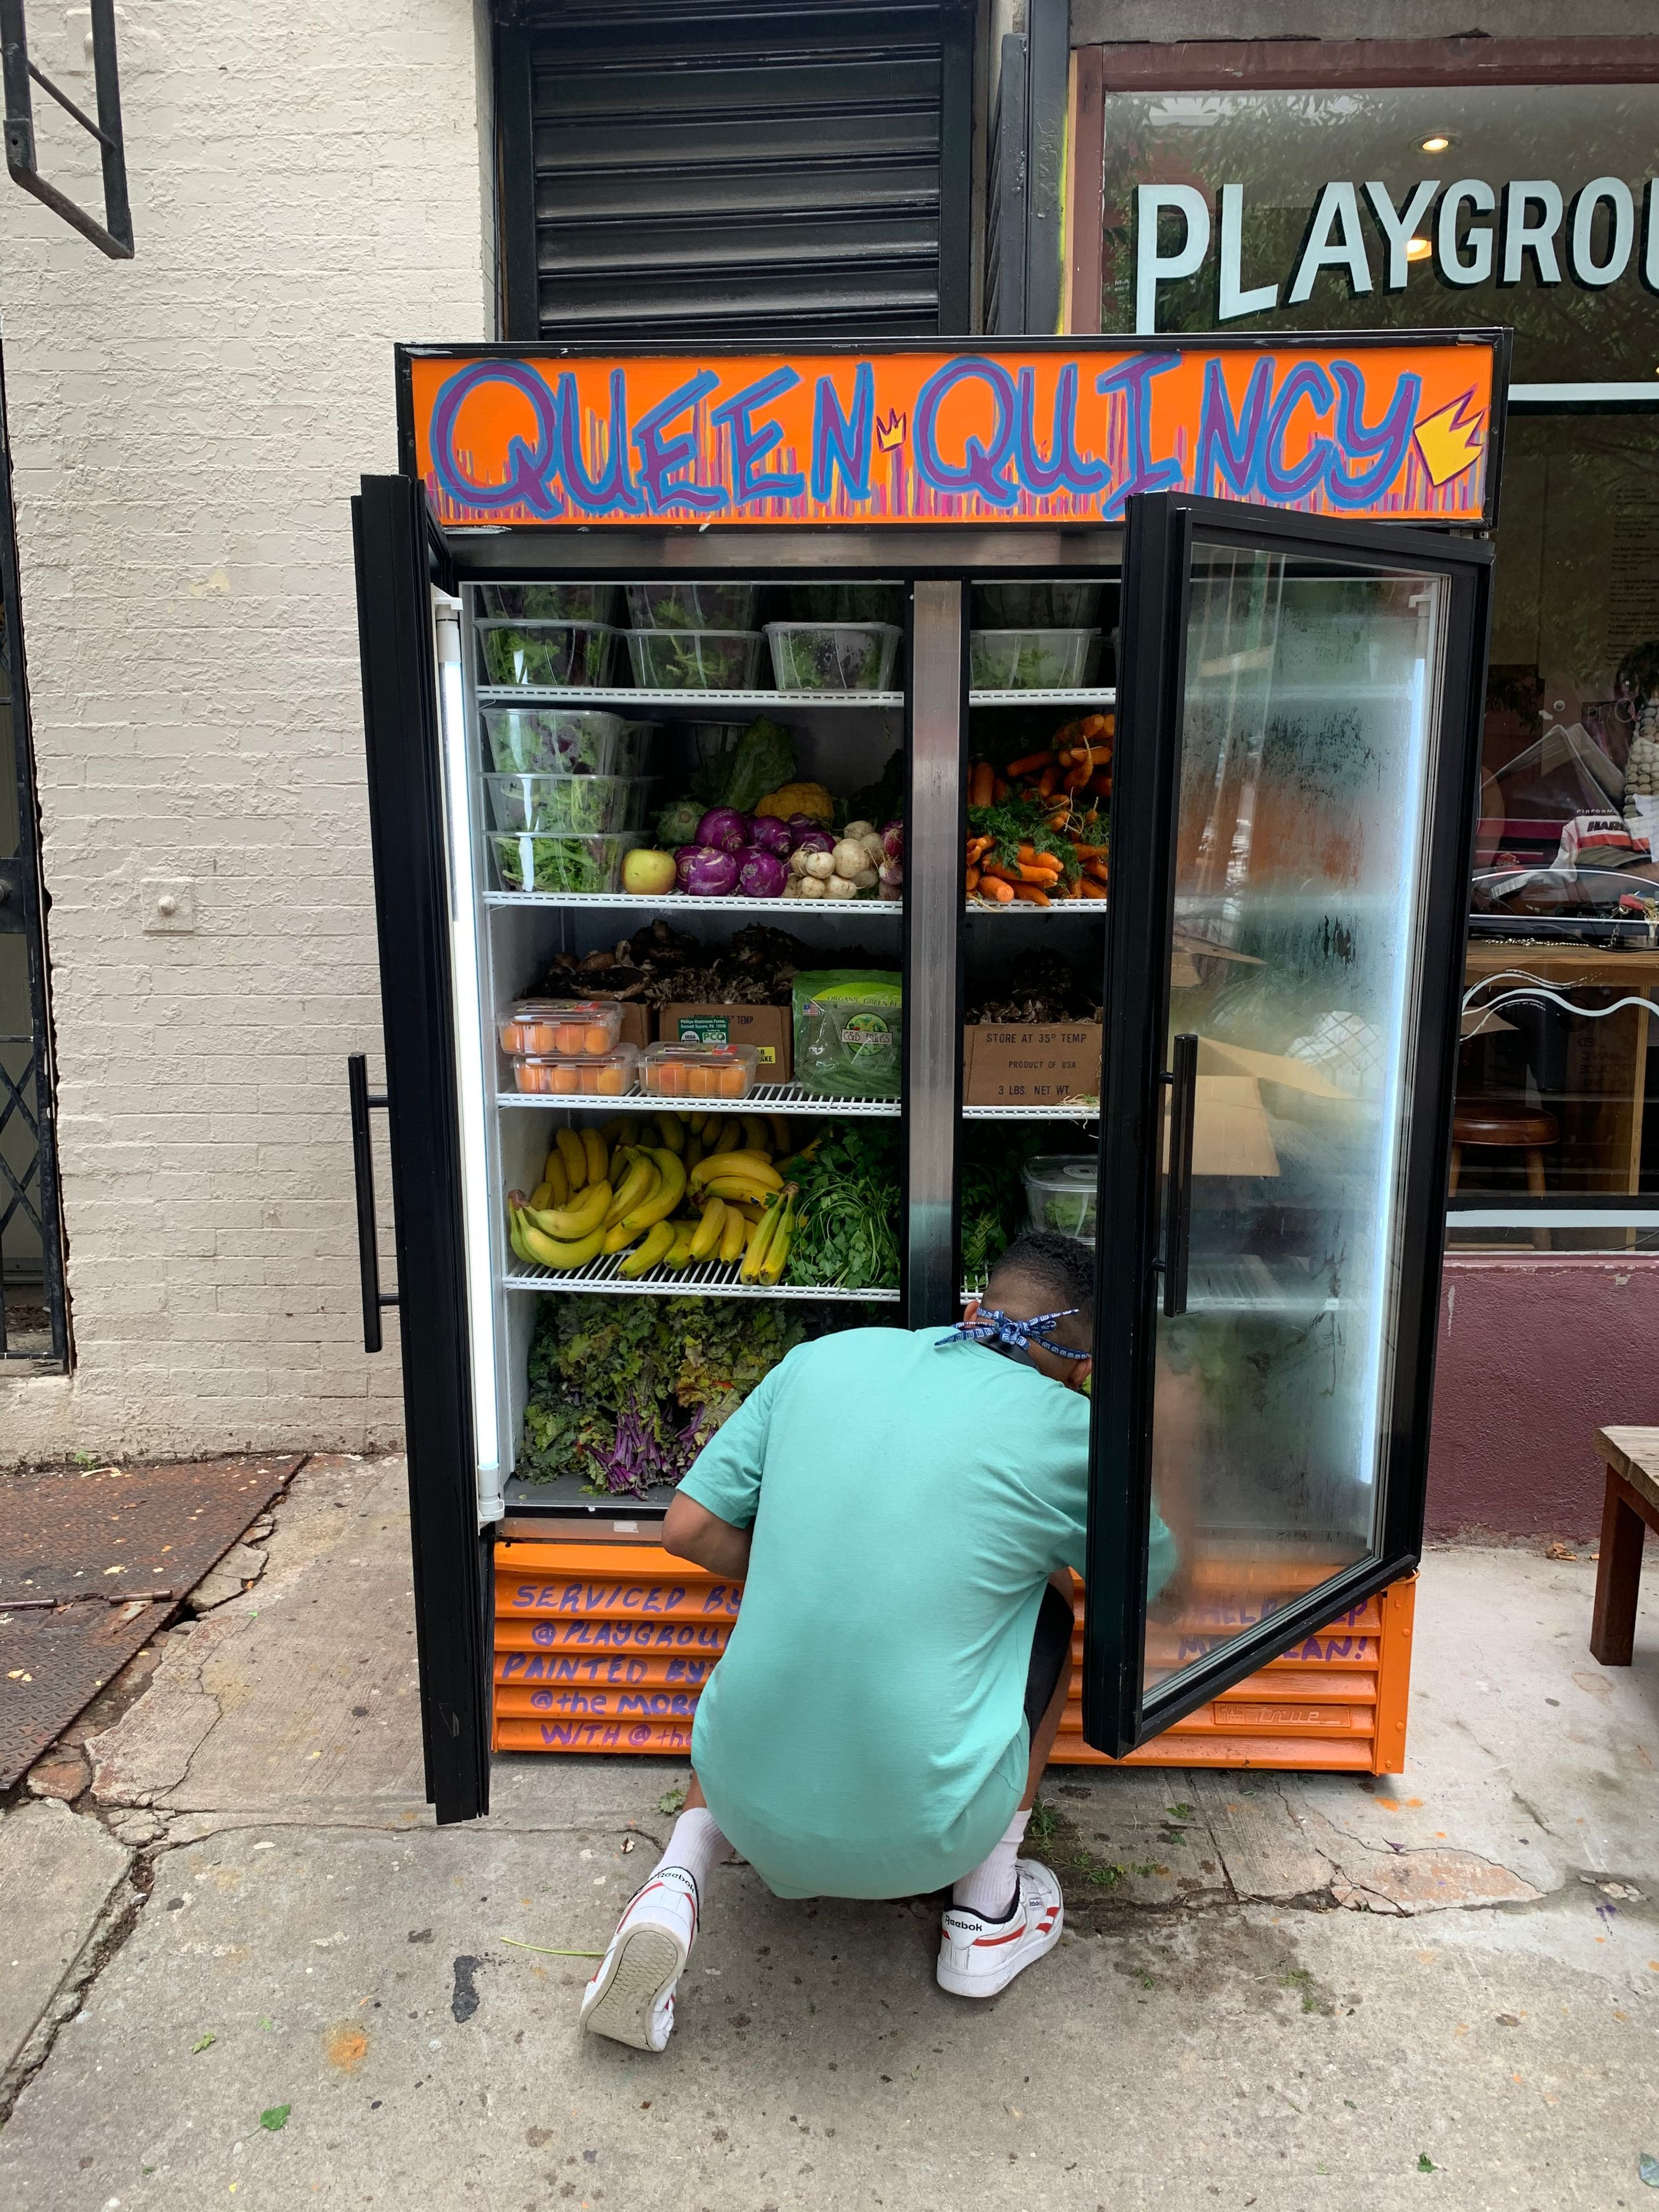 Edward Rivera filling the Community Fridge outside of Playground Coffee Shop.